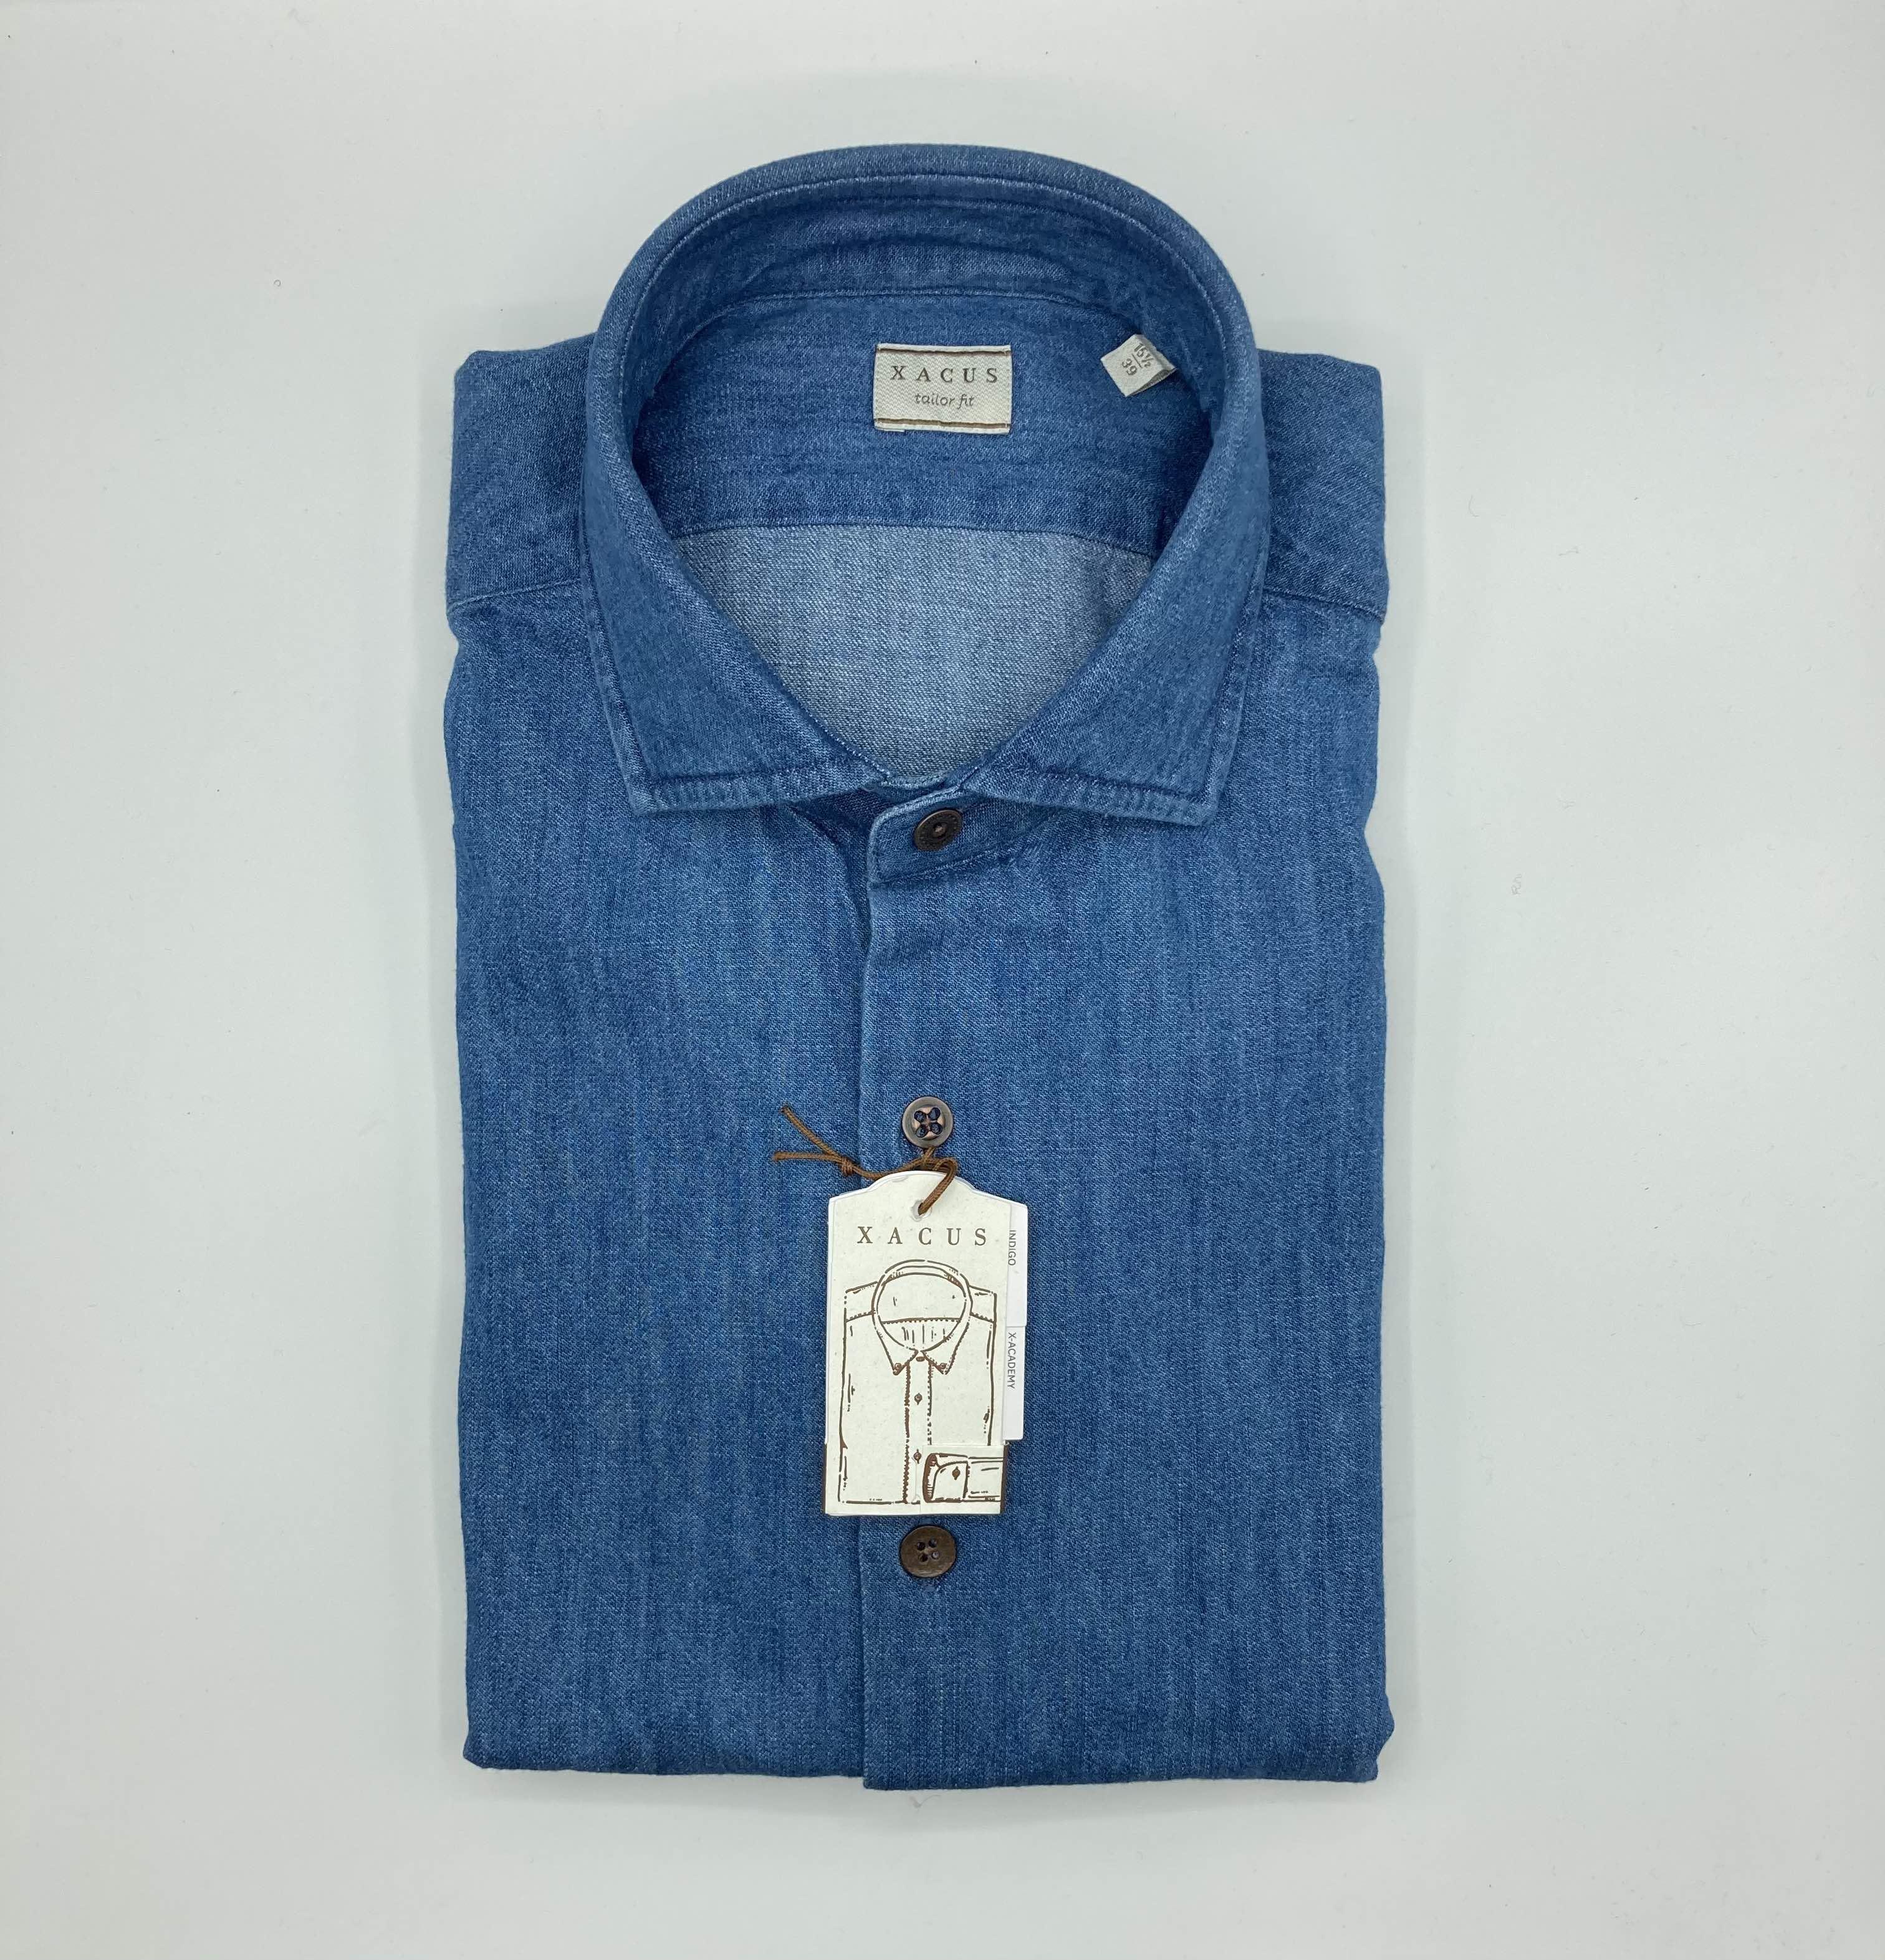 Camicia Xacus, denim pesante